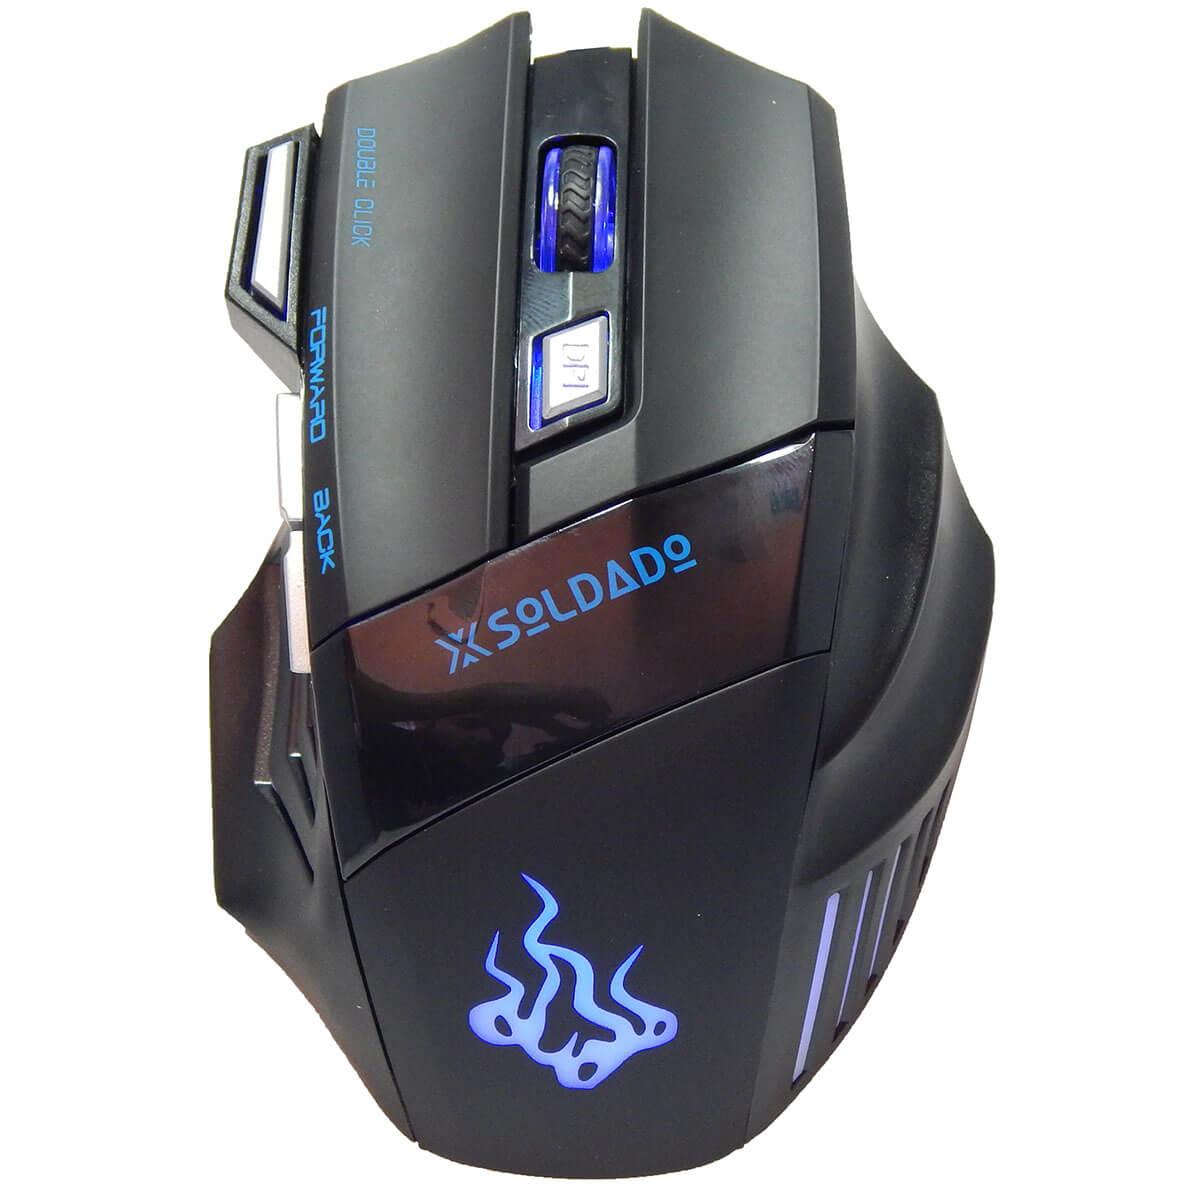 Mouse Gamer Usb 7D Extreme Infokit GM-700